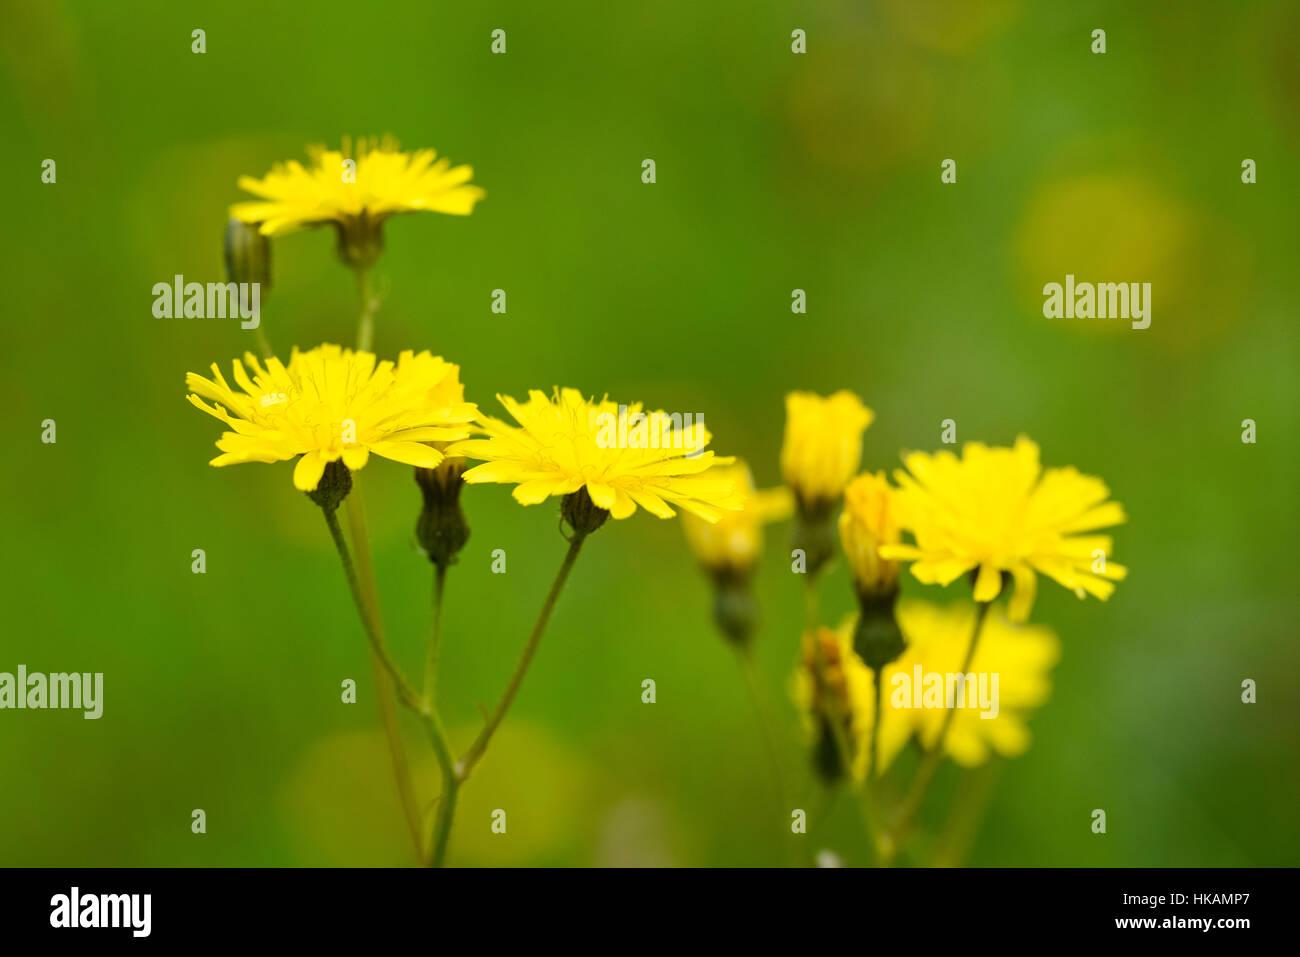 Rough Hawk's-beard, Crepis biennis, wildflower, Dumfries & Galloway, Scotland - Stock Image